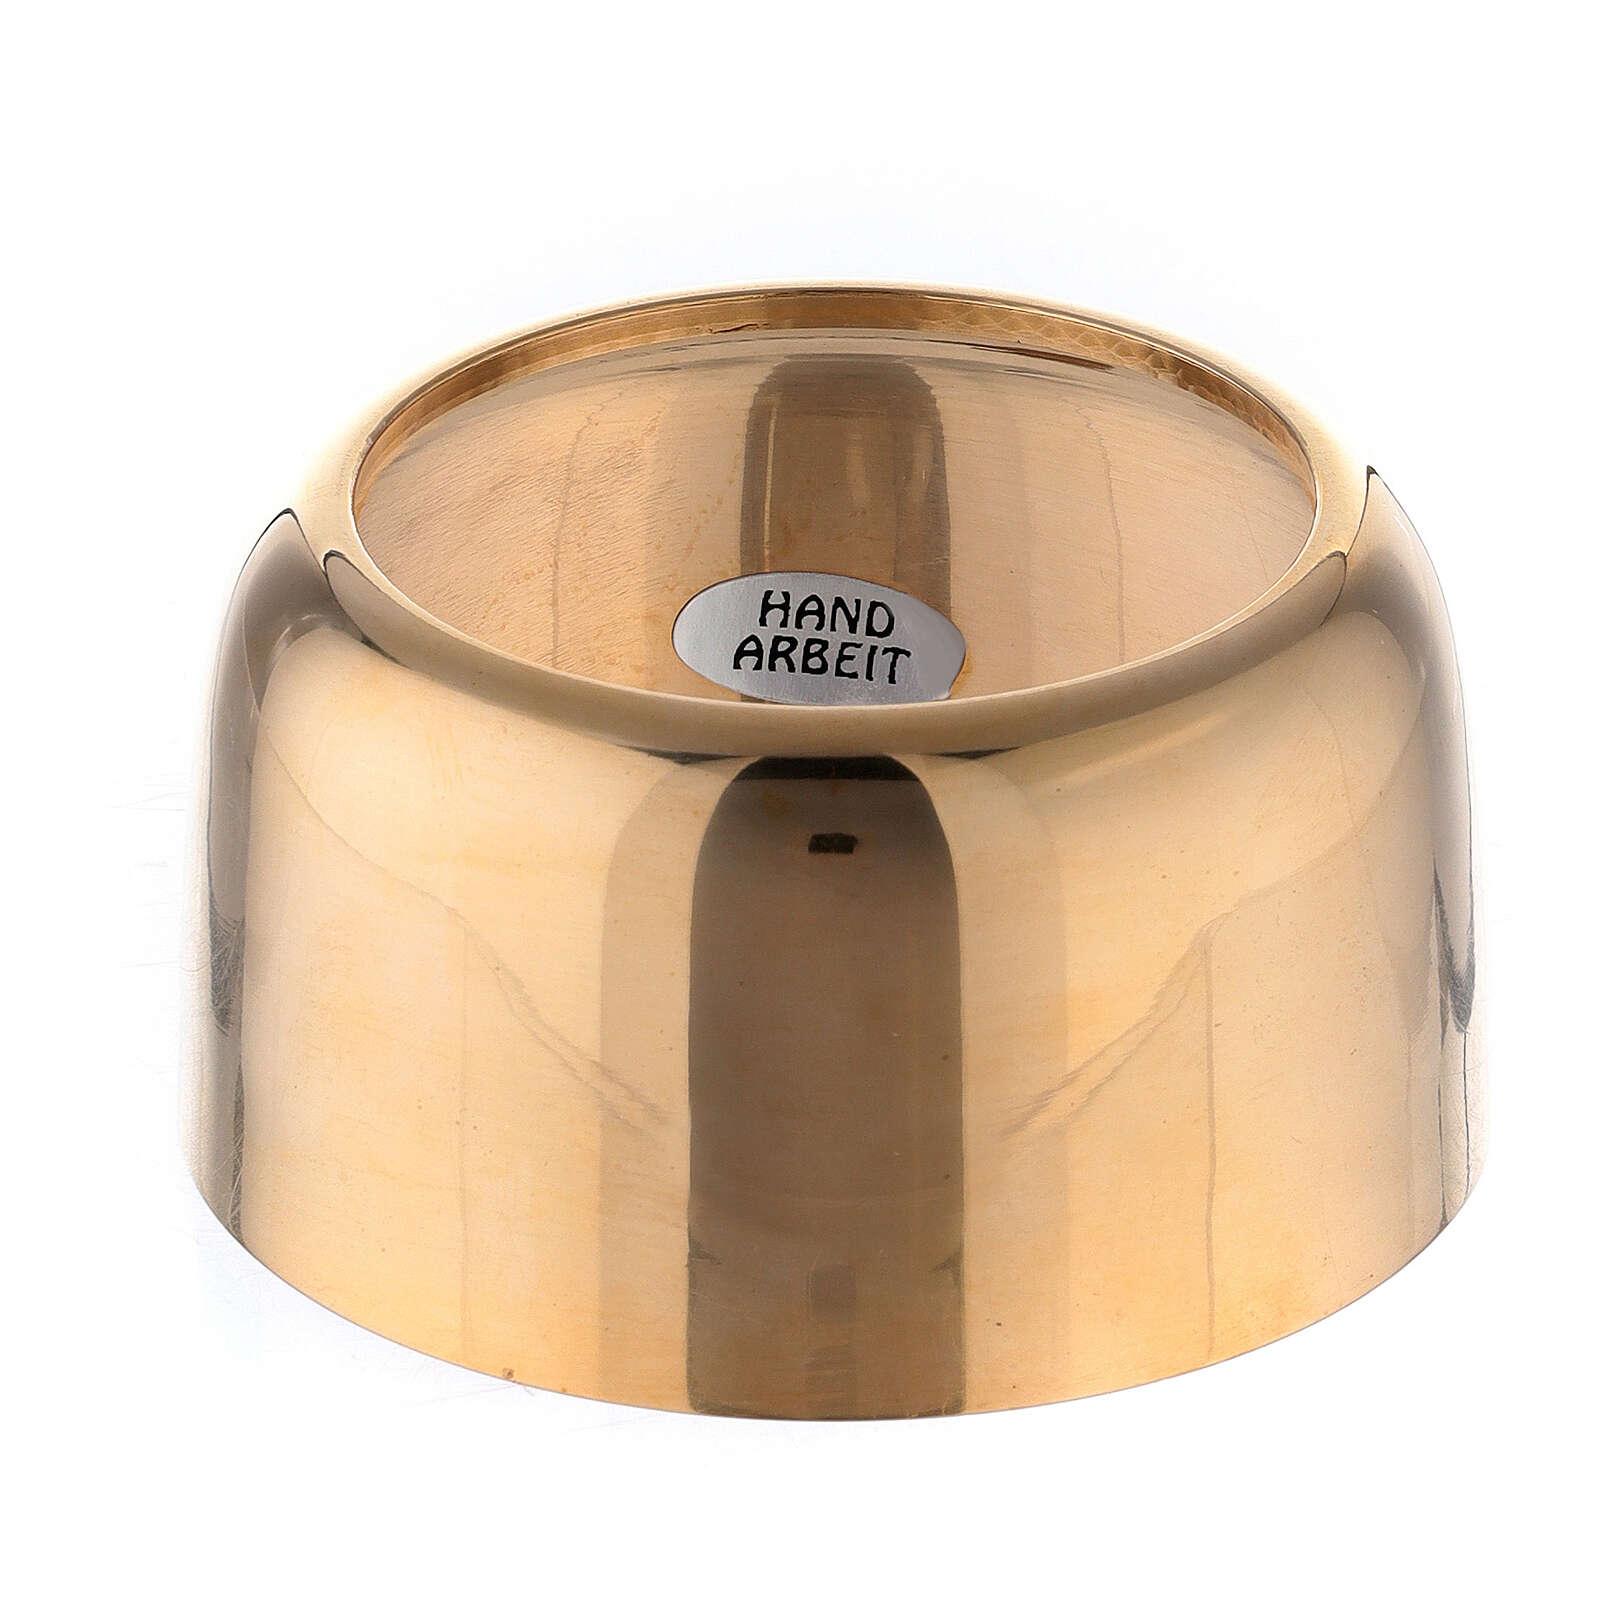 Base portacandela in ottone dorato diam. 2 cm 4